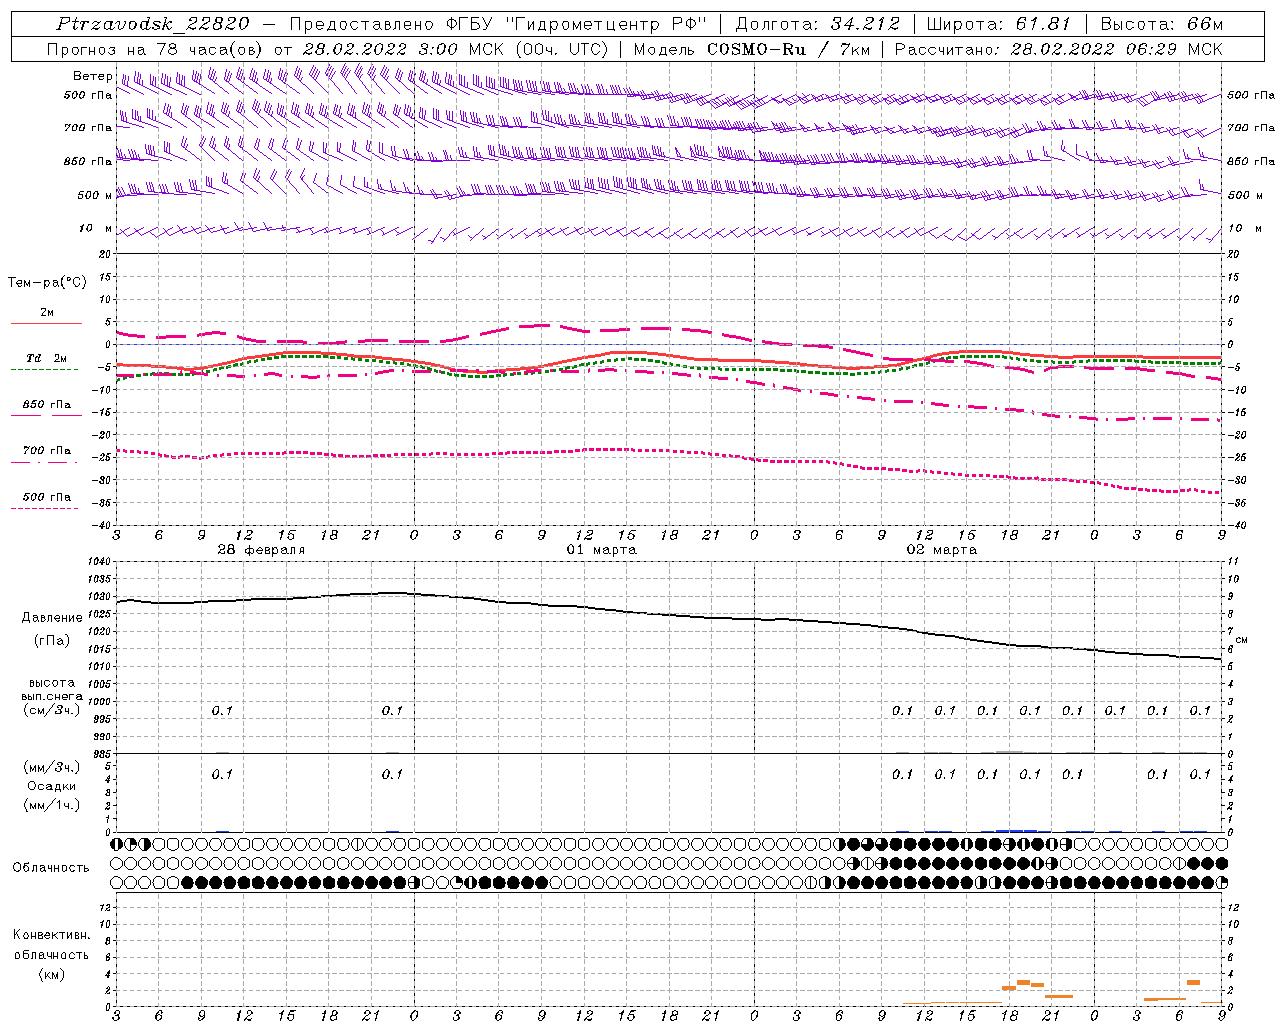 Модель COSMO-RU